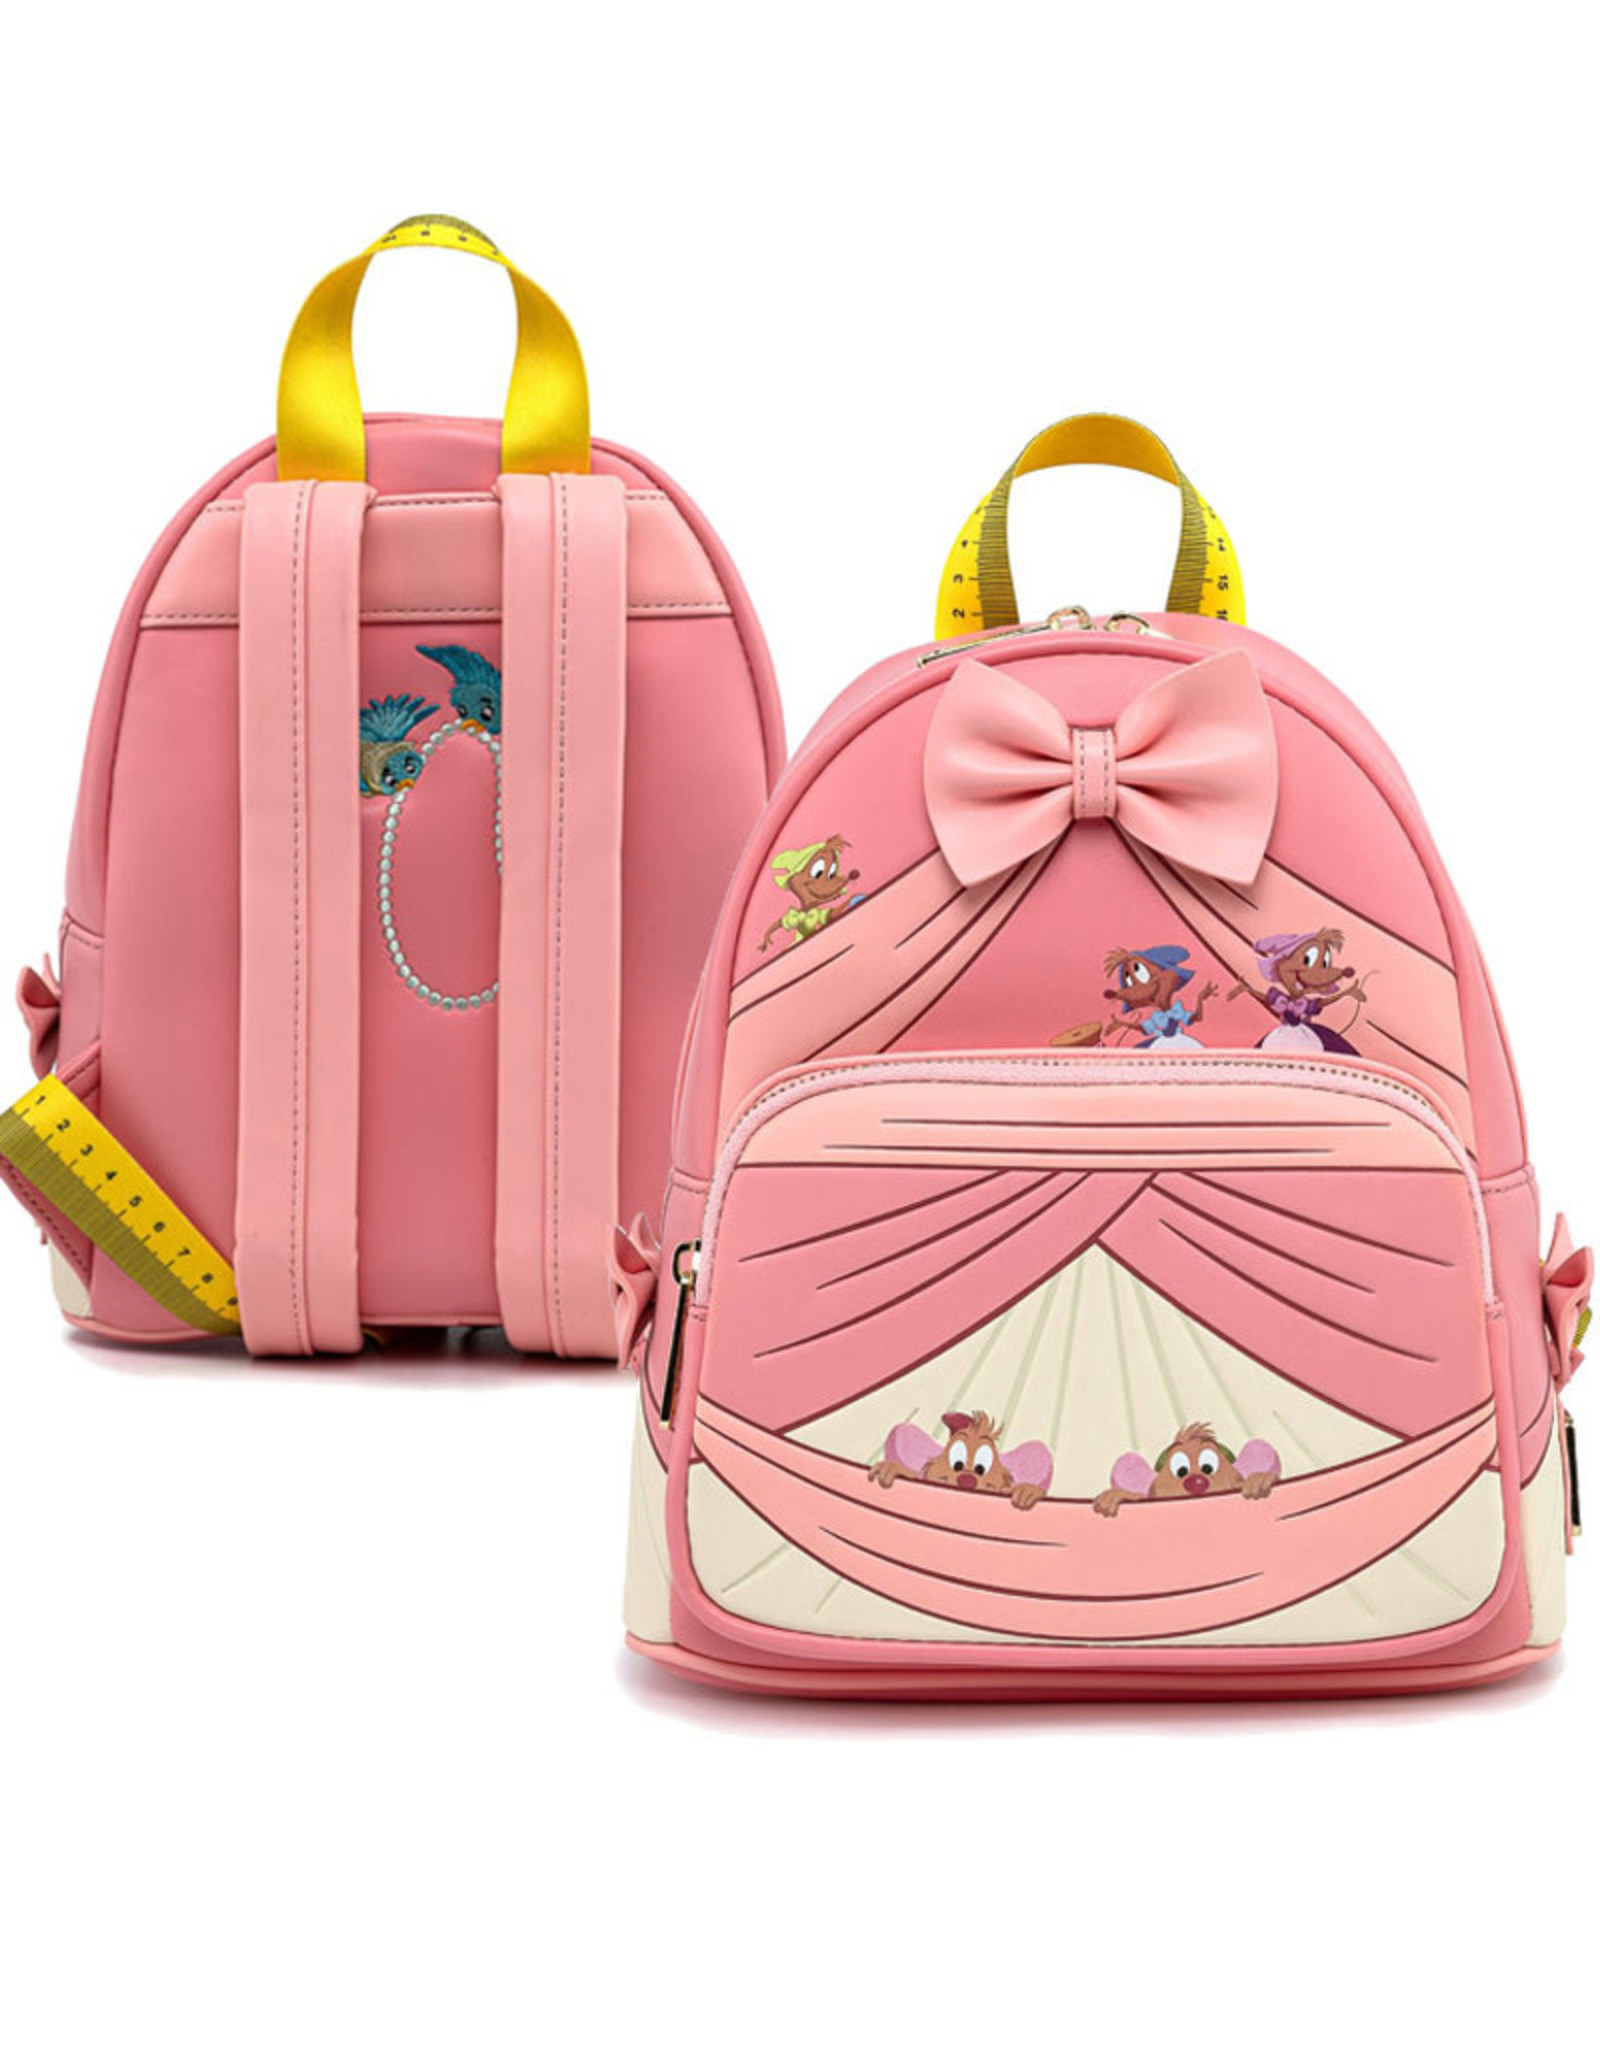 Disney Disney ( Loungefly Backpack ) Cinderella